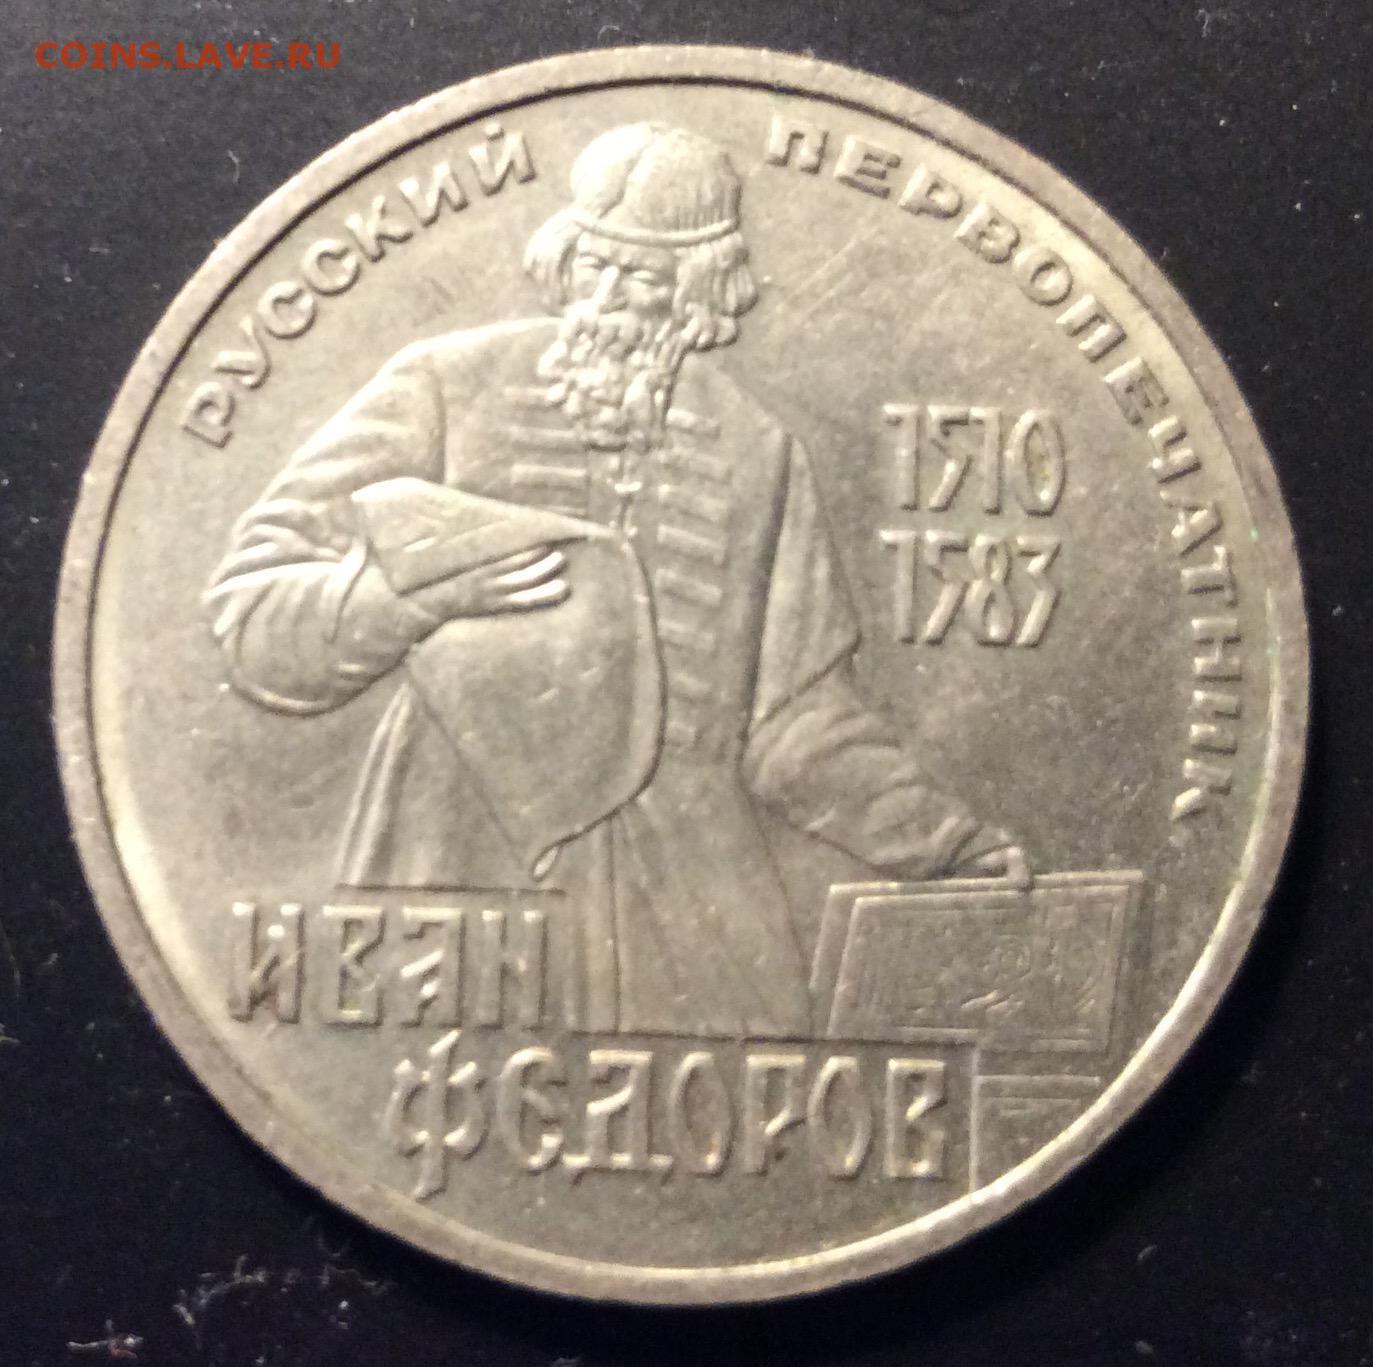 1 рубль 1983 иван федоров цена монета два рубля 1722 года